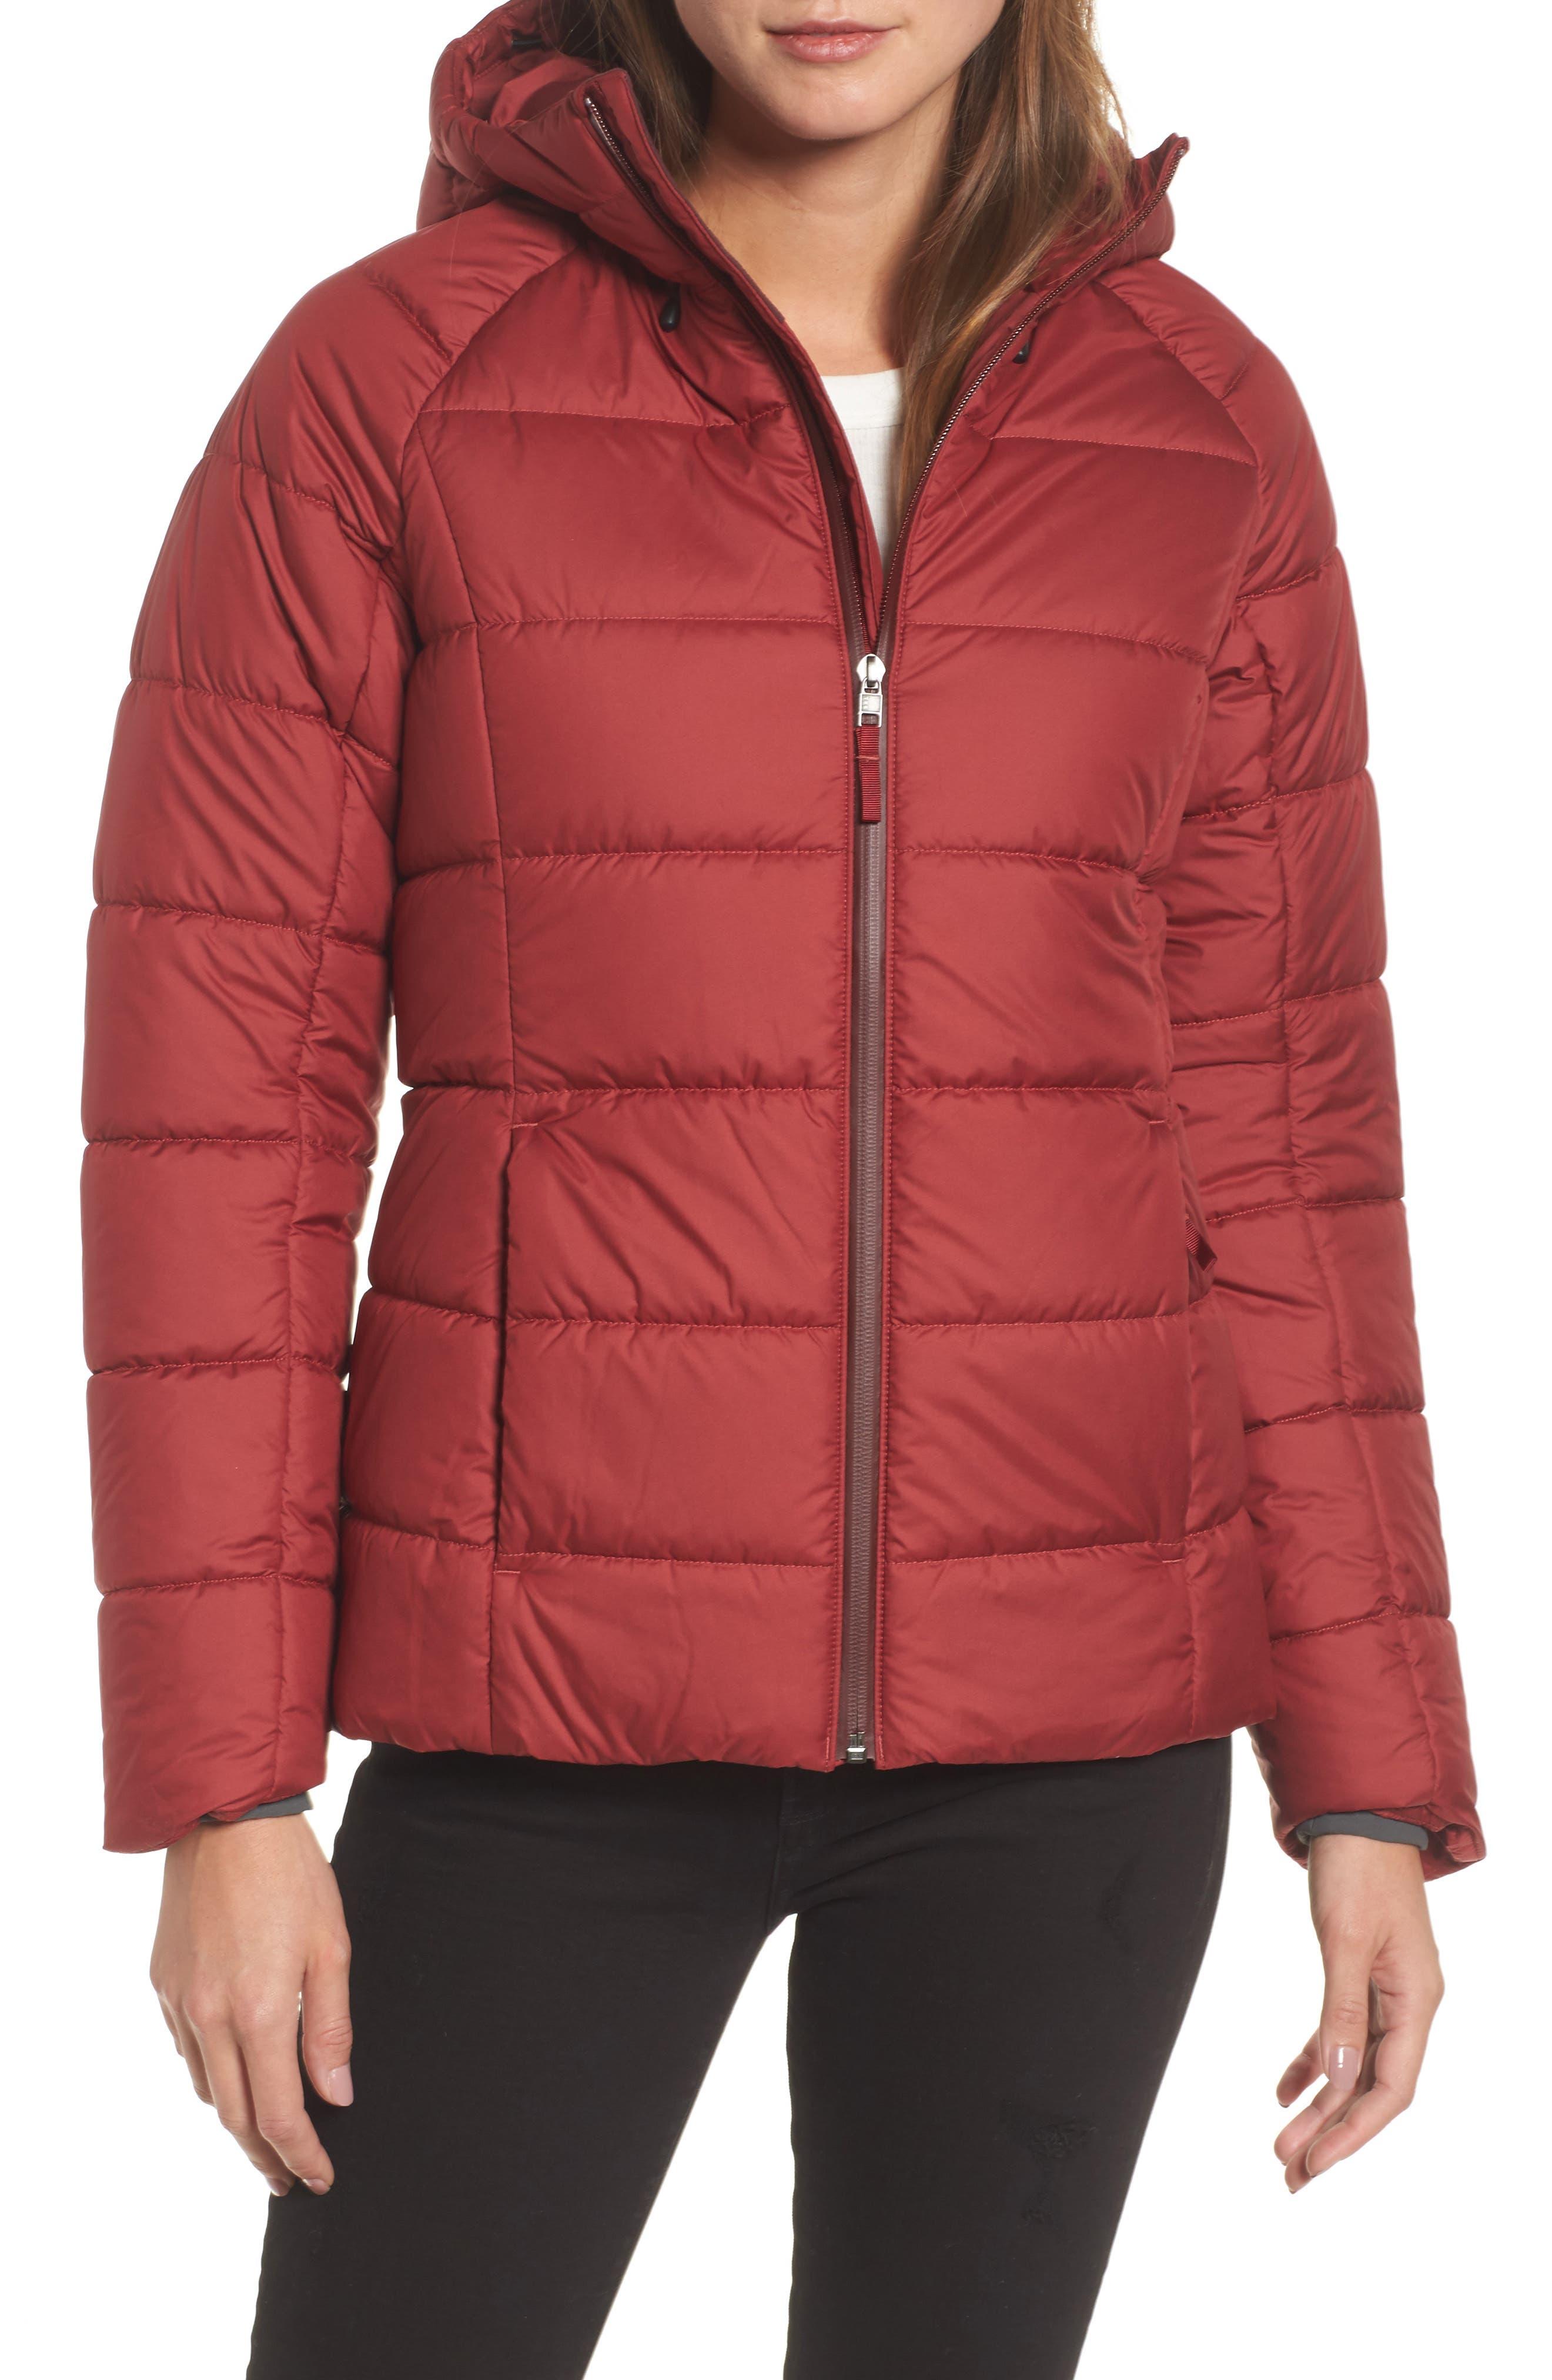 Main Image - Patagonia Transitional HyperDAS™ Insulated Jacket